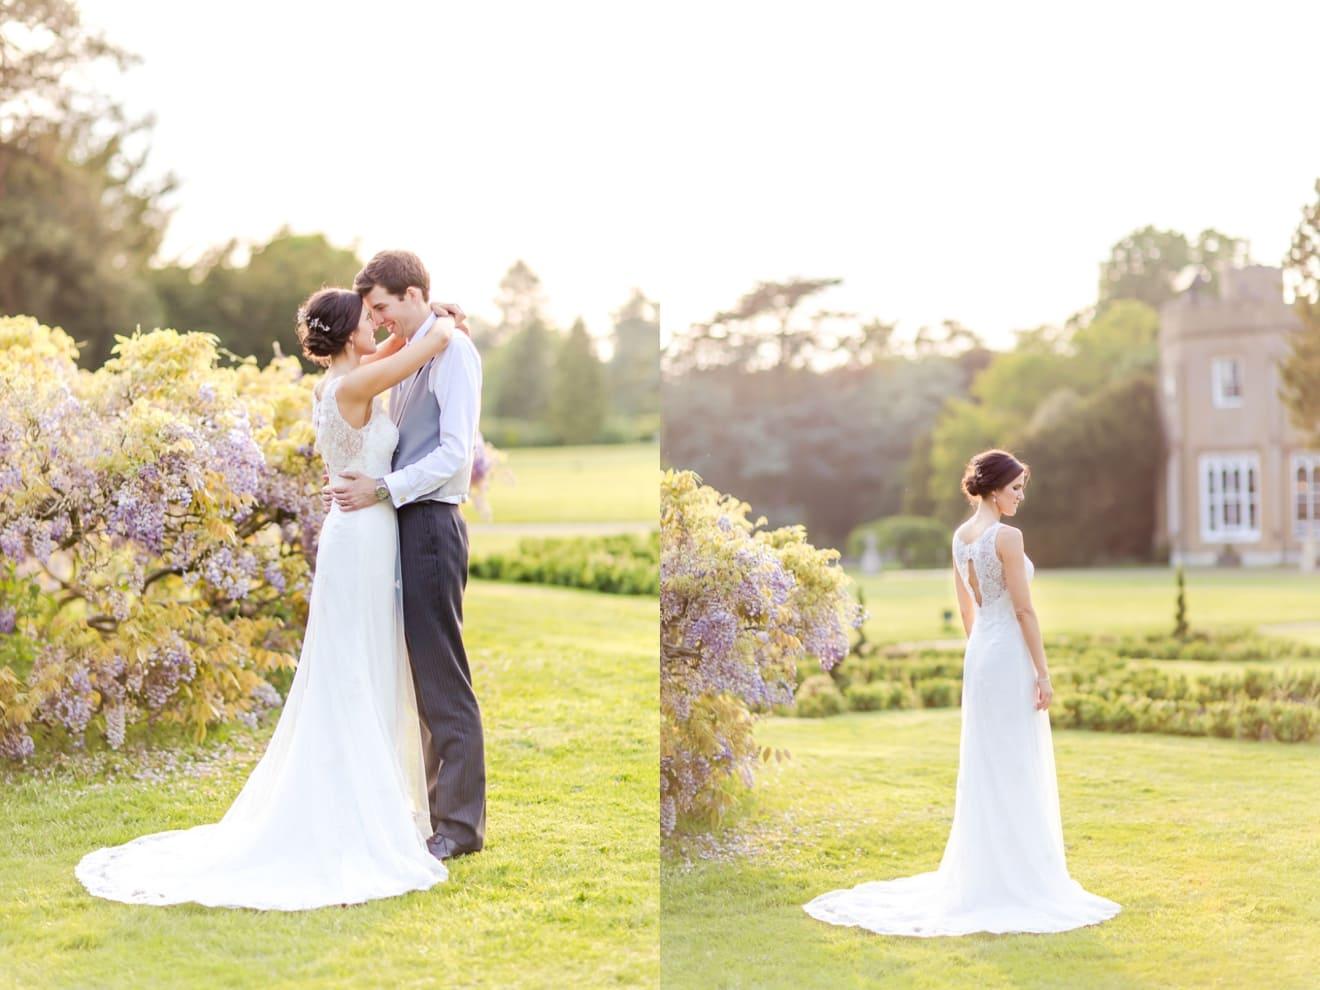 39-nonsuch-mansion-ali-tom-wedding-Eddie-Judd-Photography